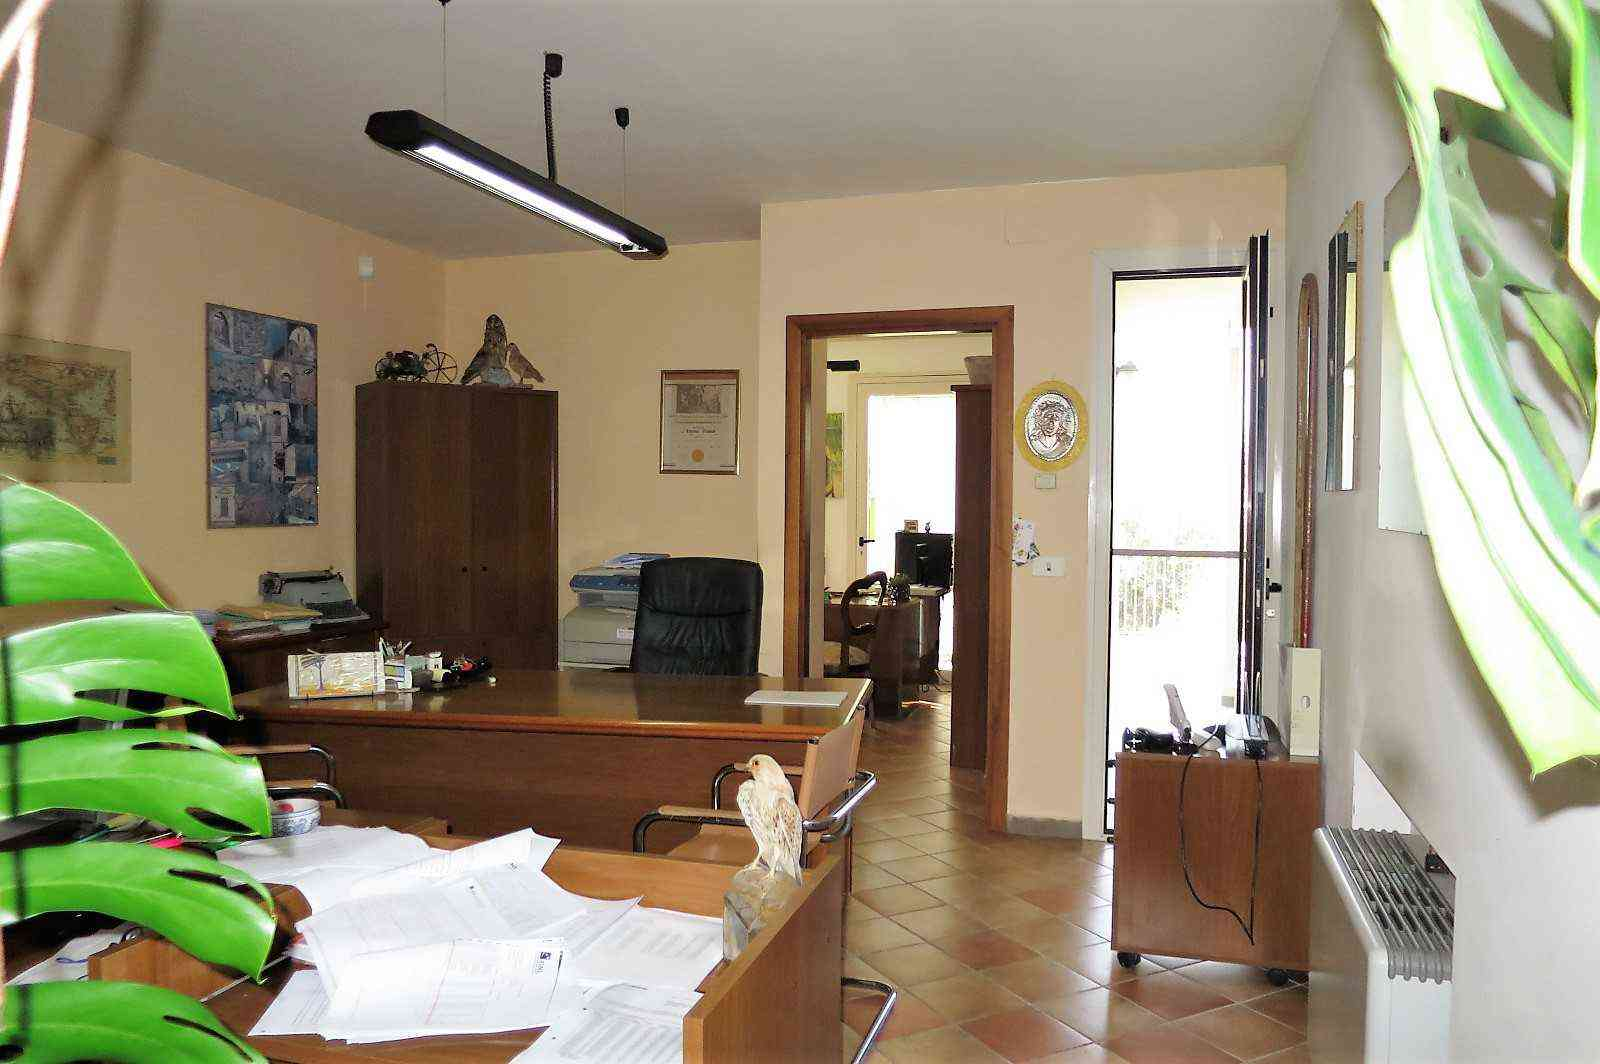 Villa Villa in vendita Atri (TE), Villa Paola - Atri - EUR 473.281 170